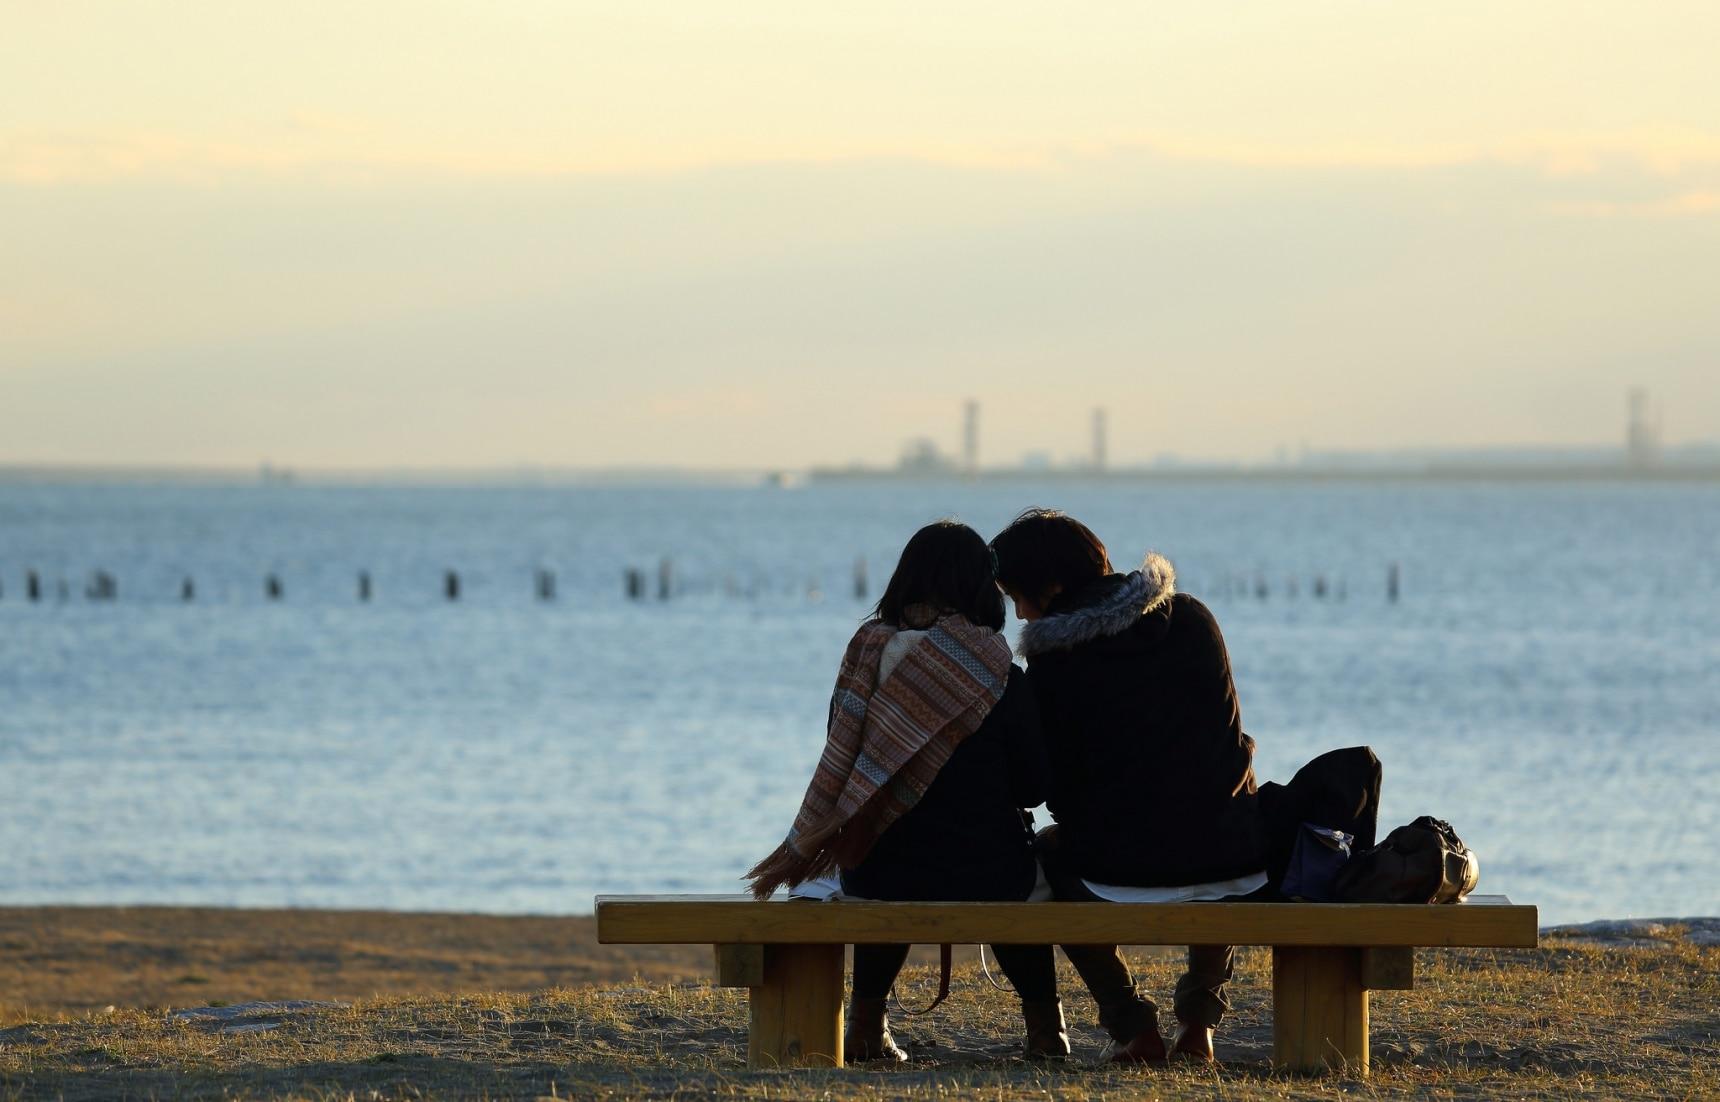 Top 10 Dating Spots in Kansai